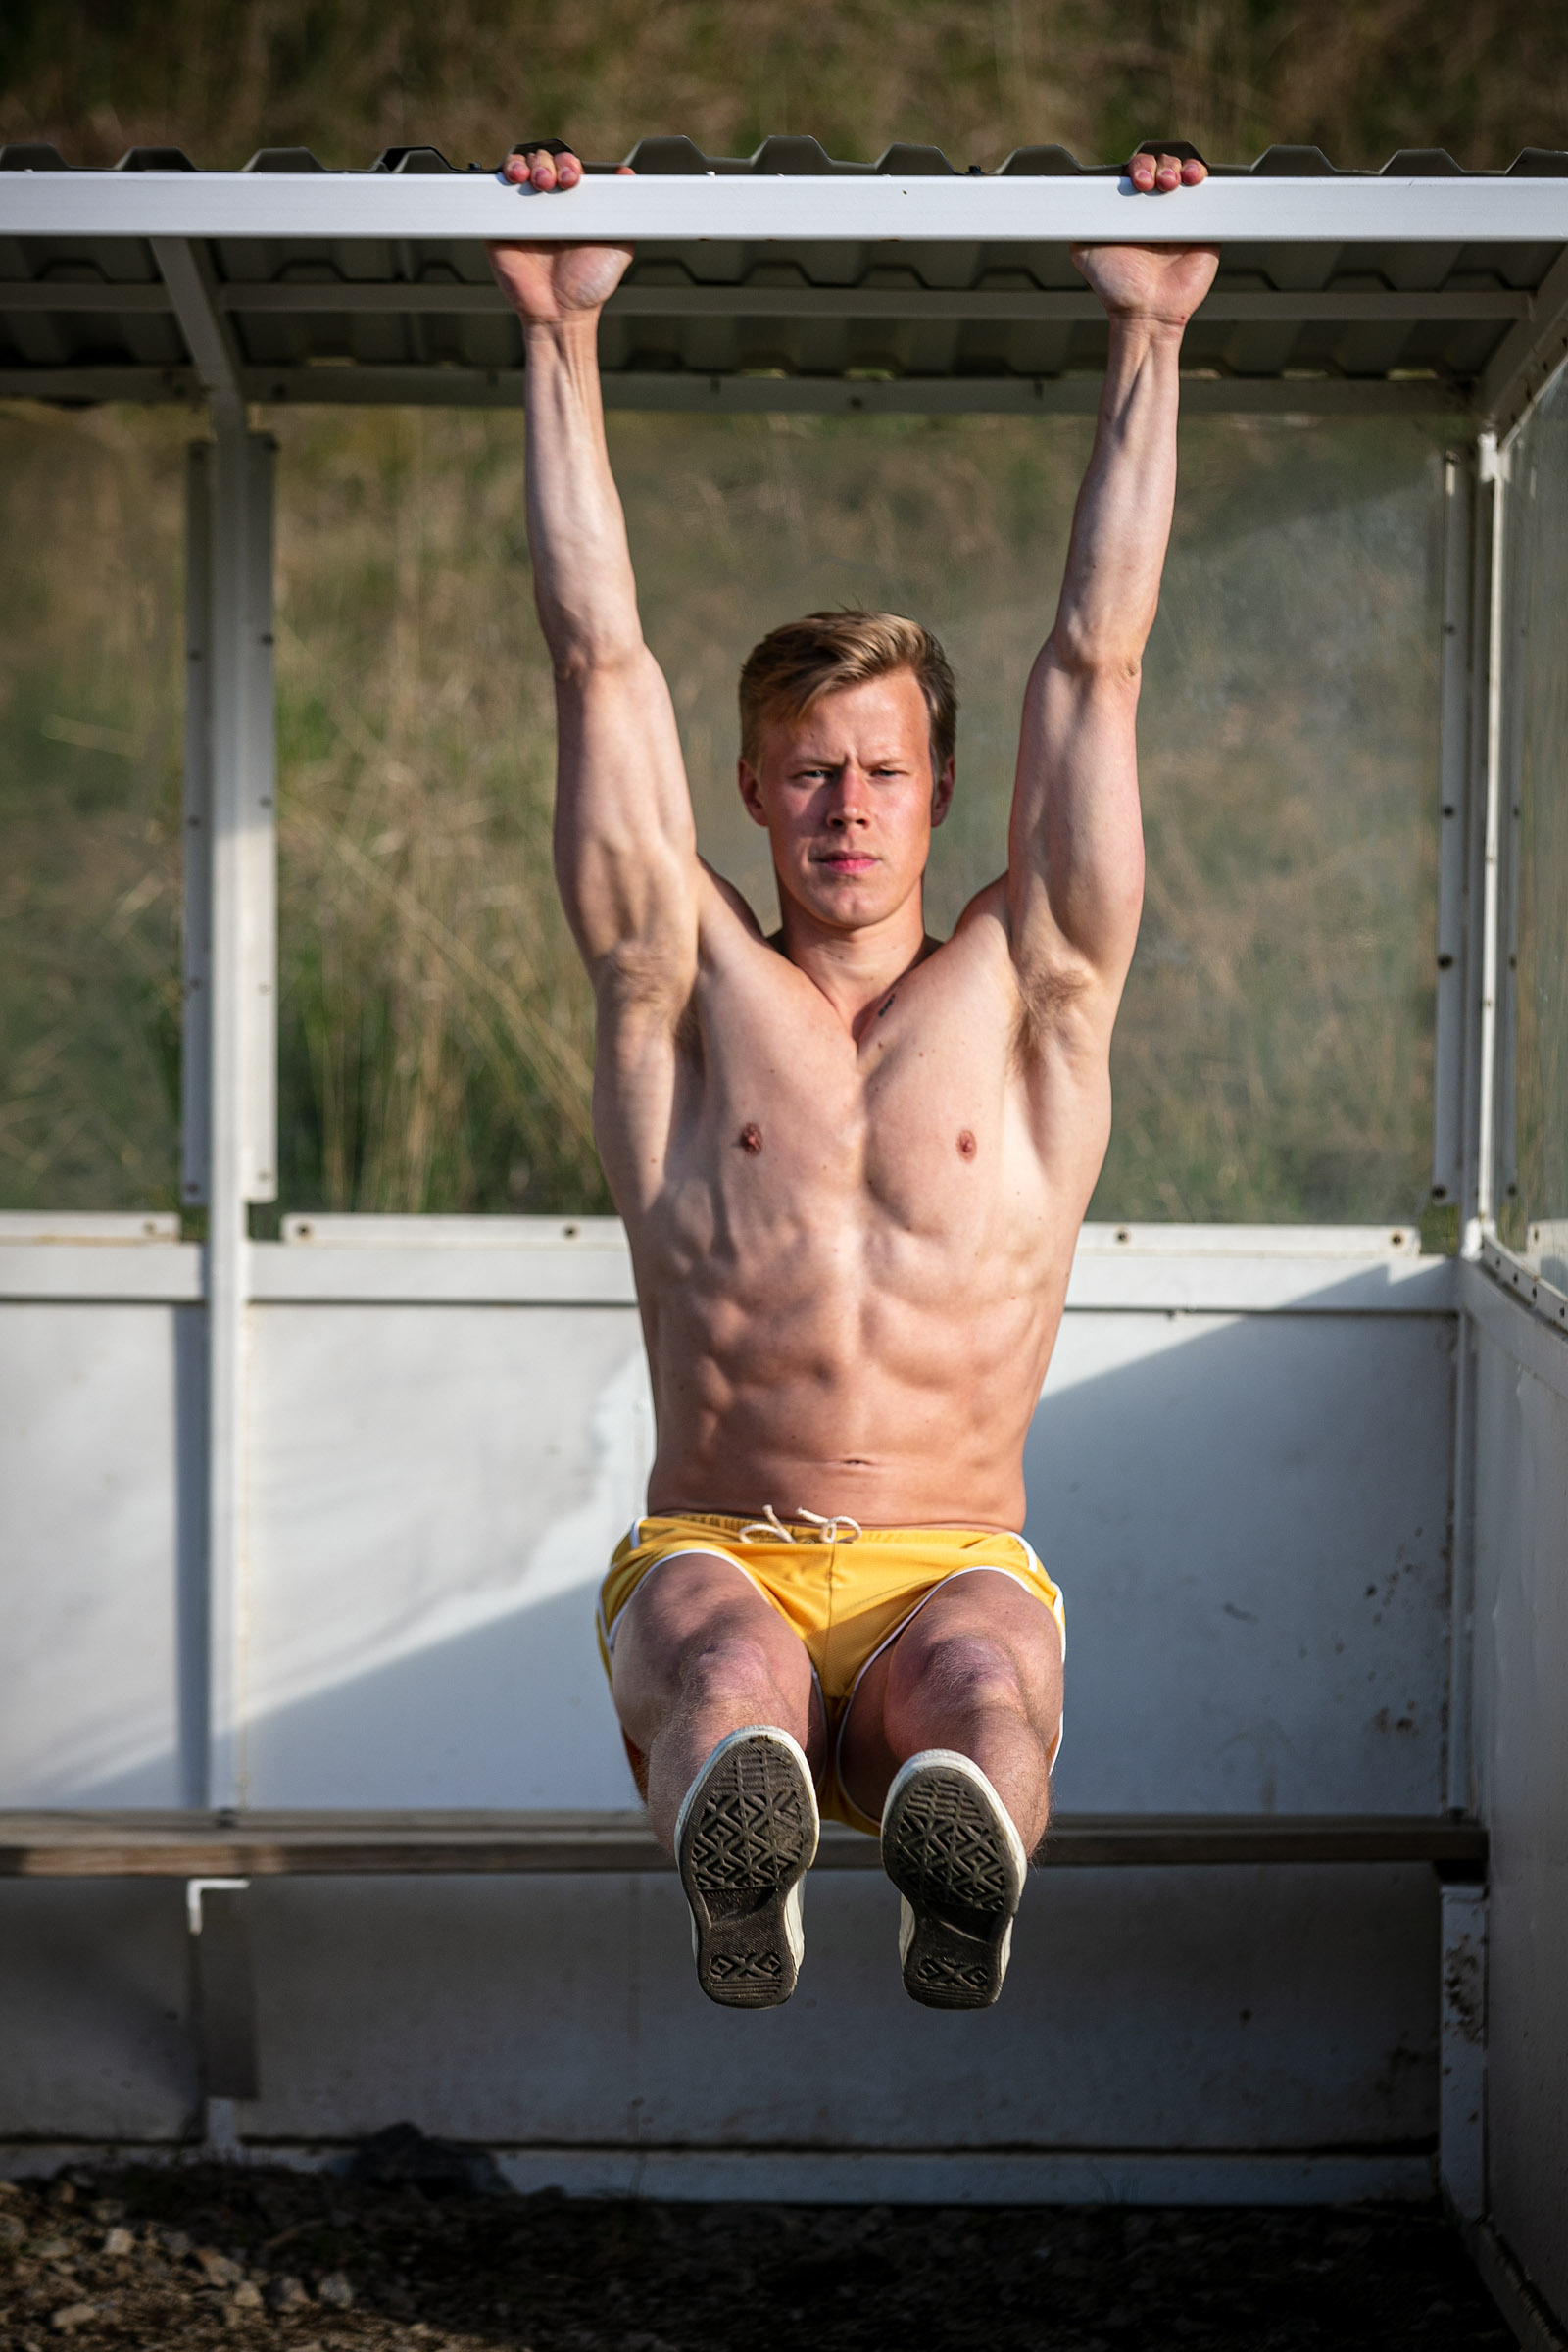 YMR_SEGT-VIRKE_Varmdo_Fitness07